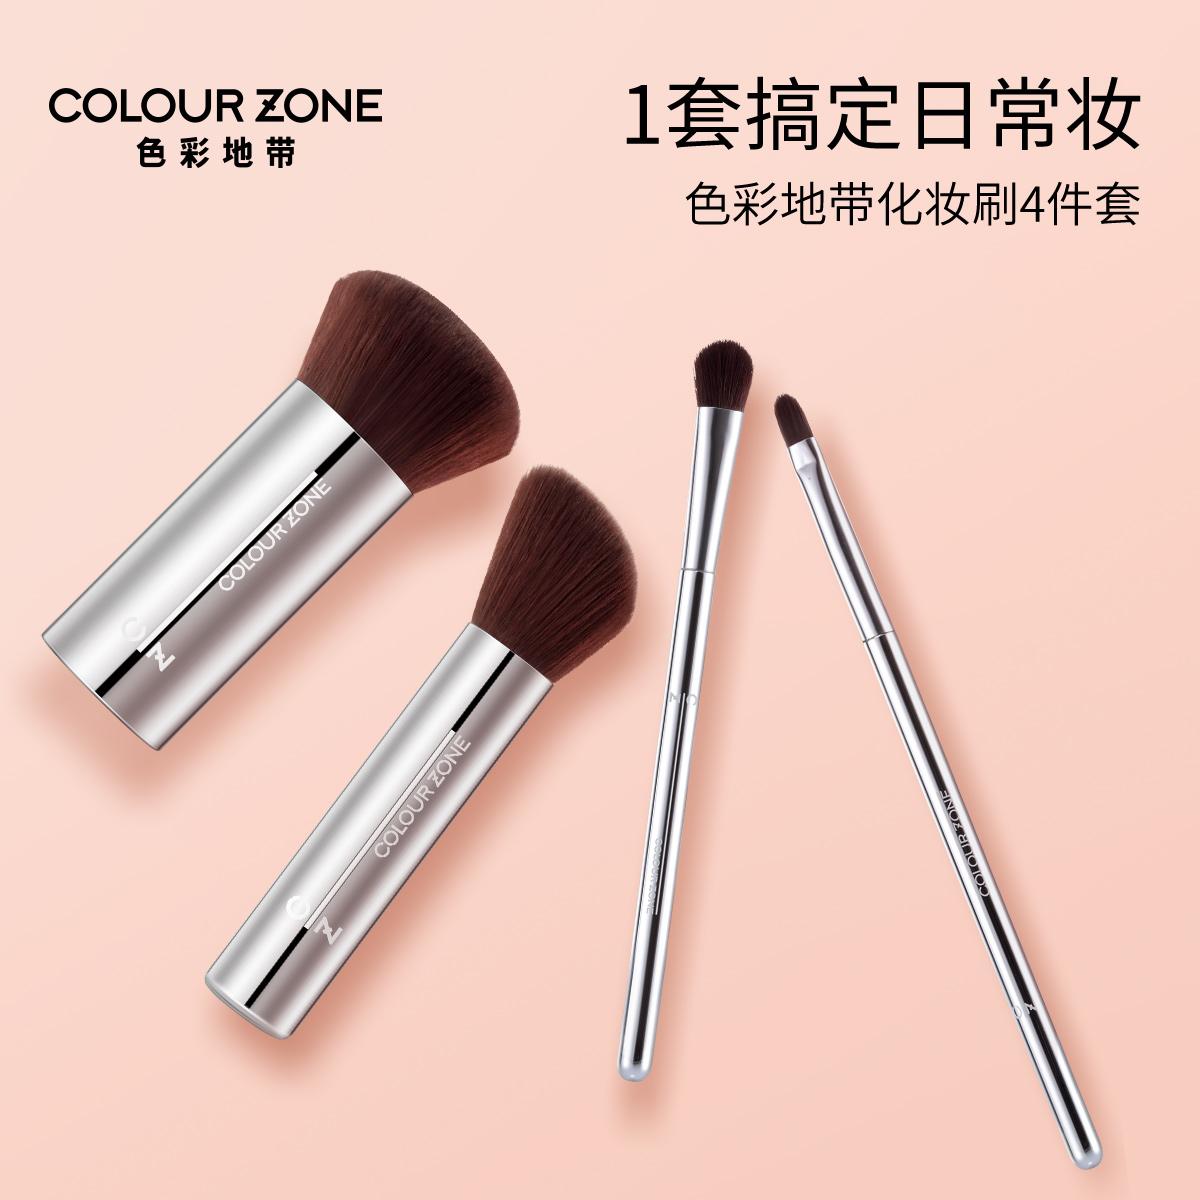 Makeup brush set, eye shadow blush powder powder brush, repair high gloss foundation brush, lip brush beauty tool.